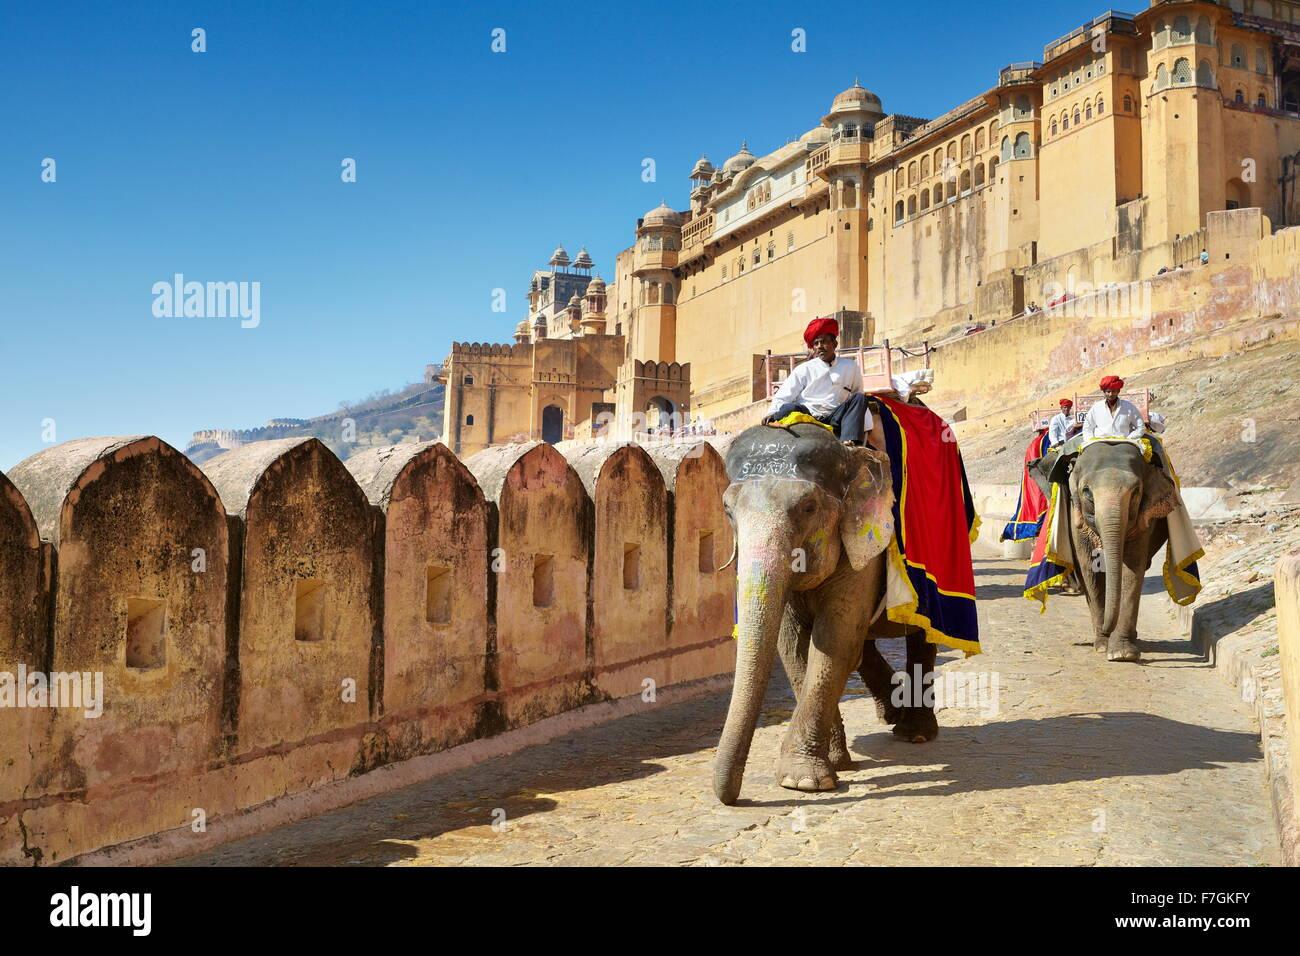 Jaipur - elefante (Elephas maximus) que regresan de la Jaipur Fuerte Amber, Rajasthan, India Imagen De Stock